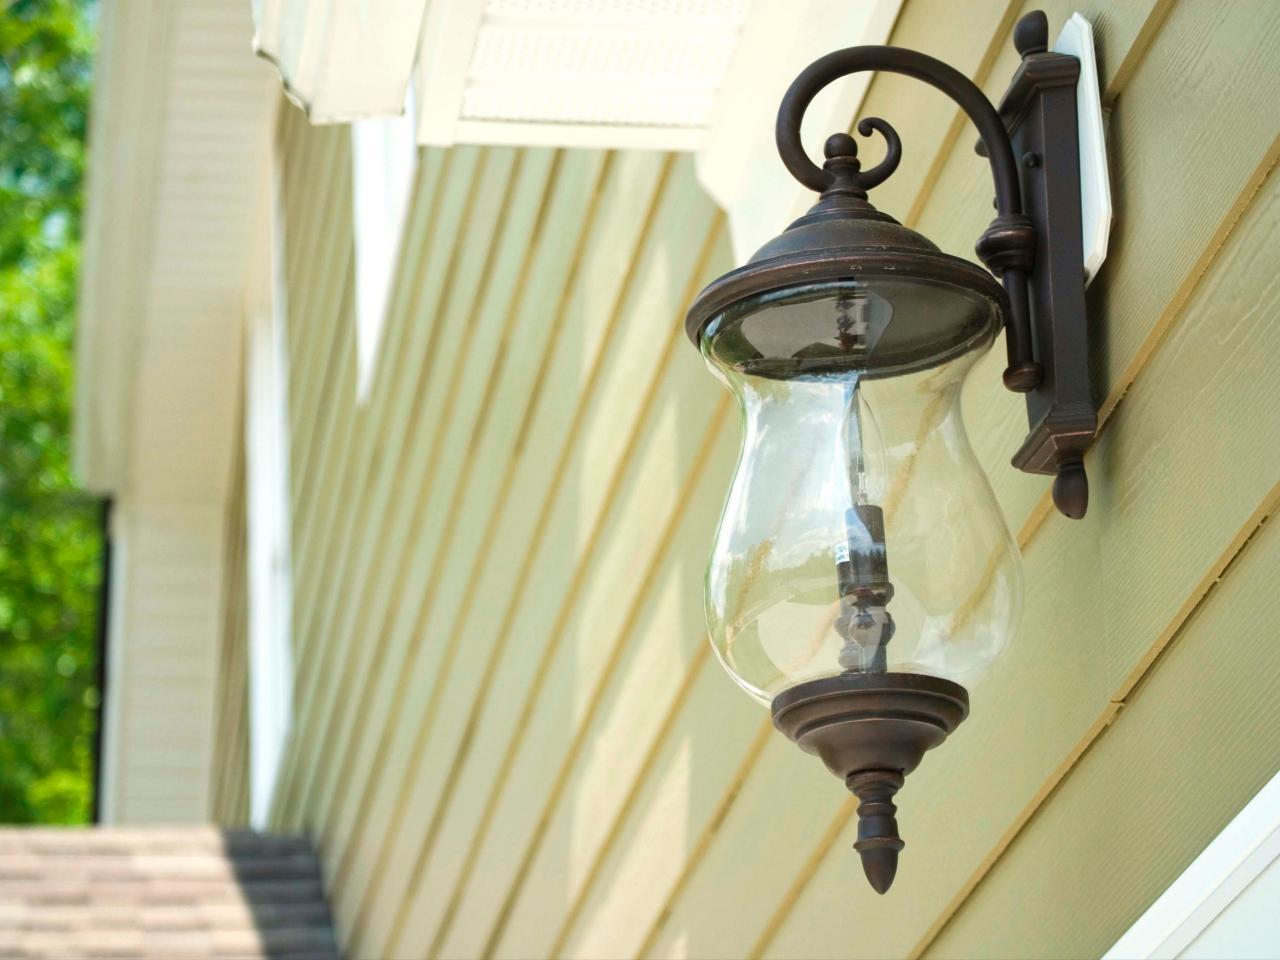 hight resolution of install wall light pmpresssecretariat of outdoor lighting diy electrical wiring howtos light fixtures